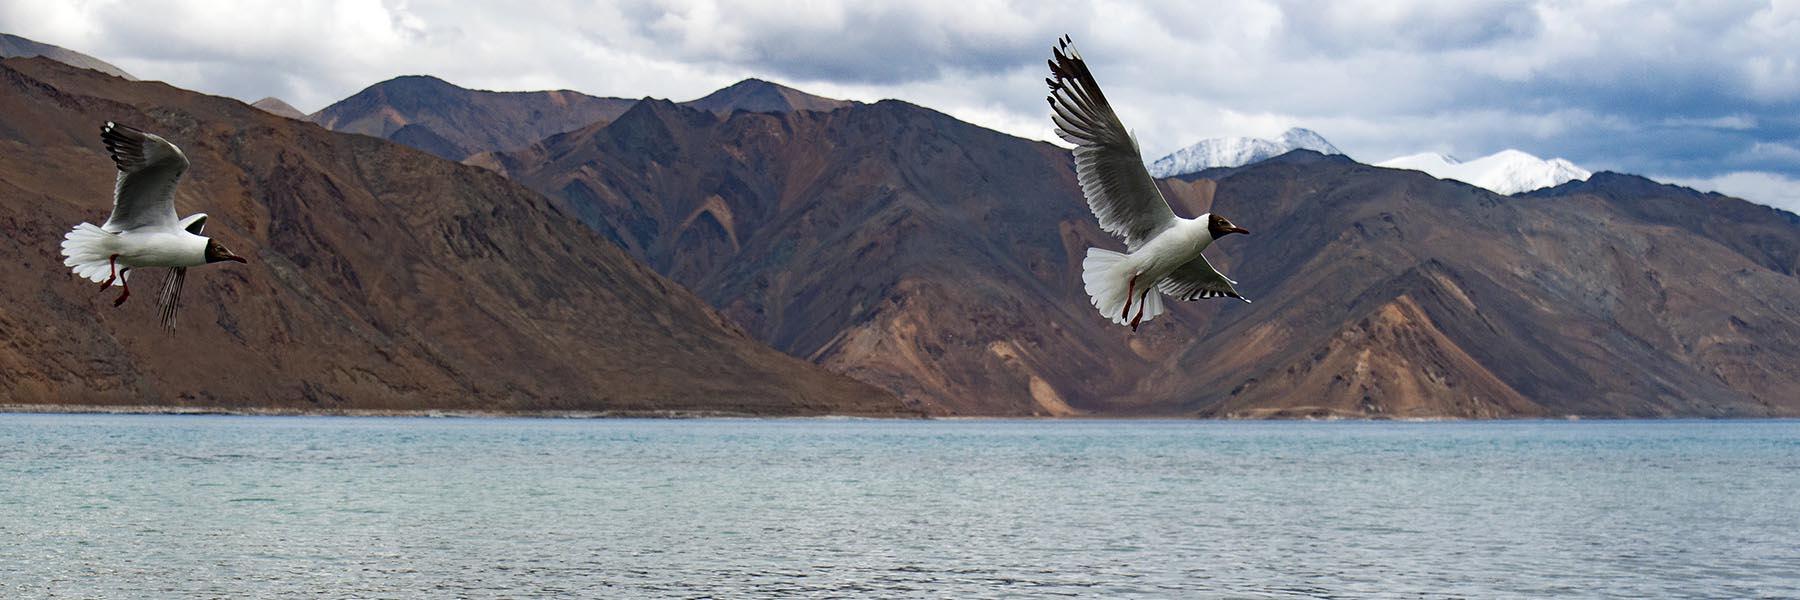 Ladakh Birding and Wildlife